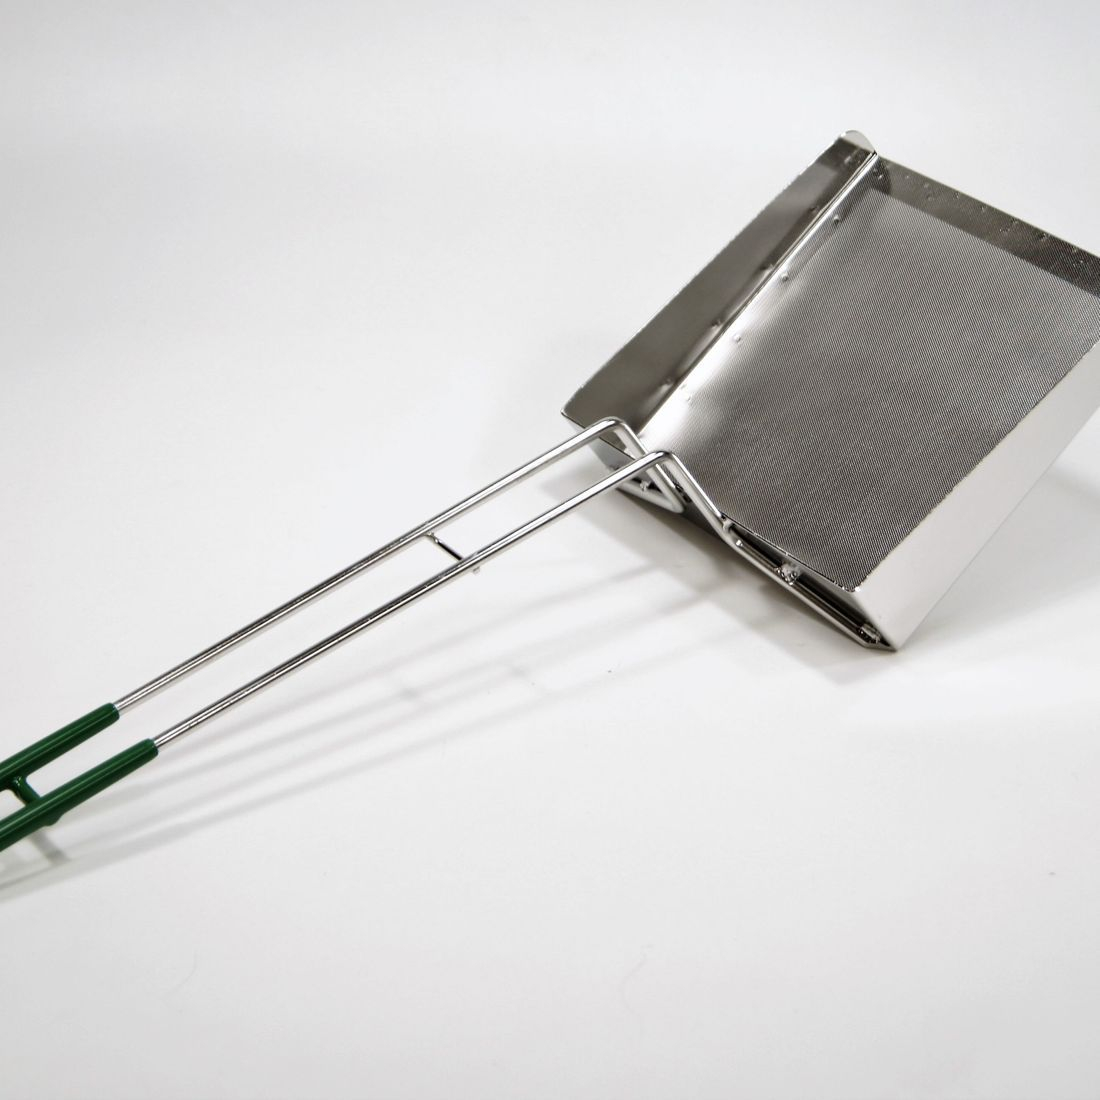 Stainless Steel Sheet Metal Skimmer